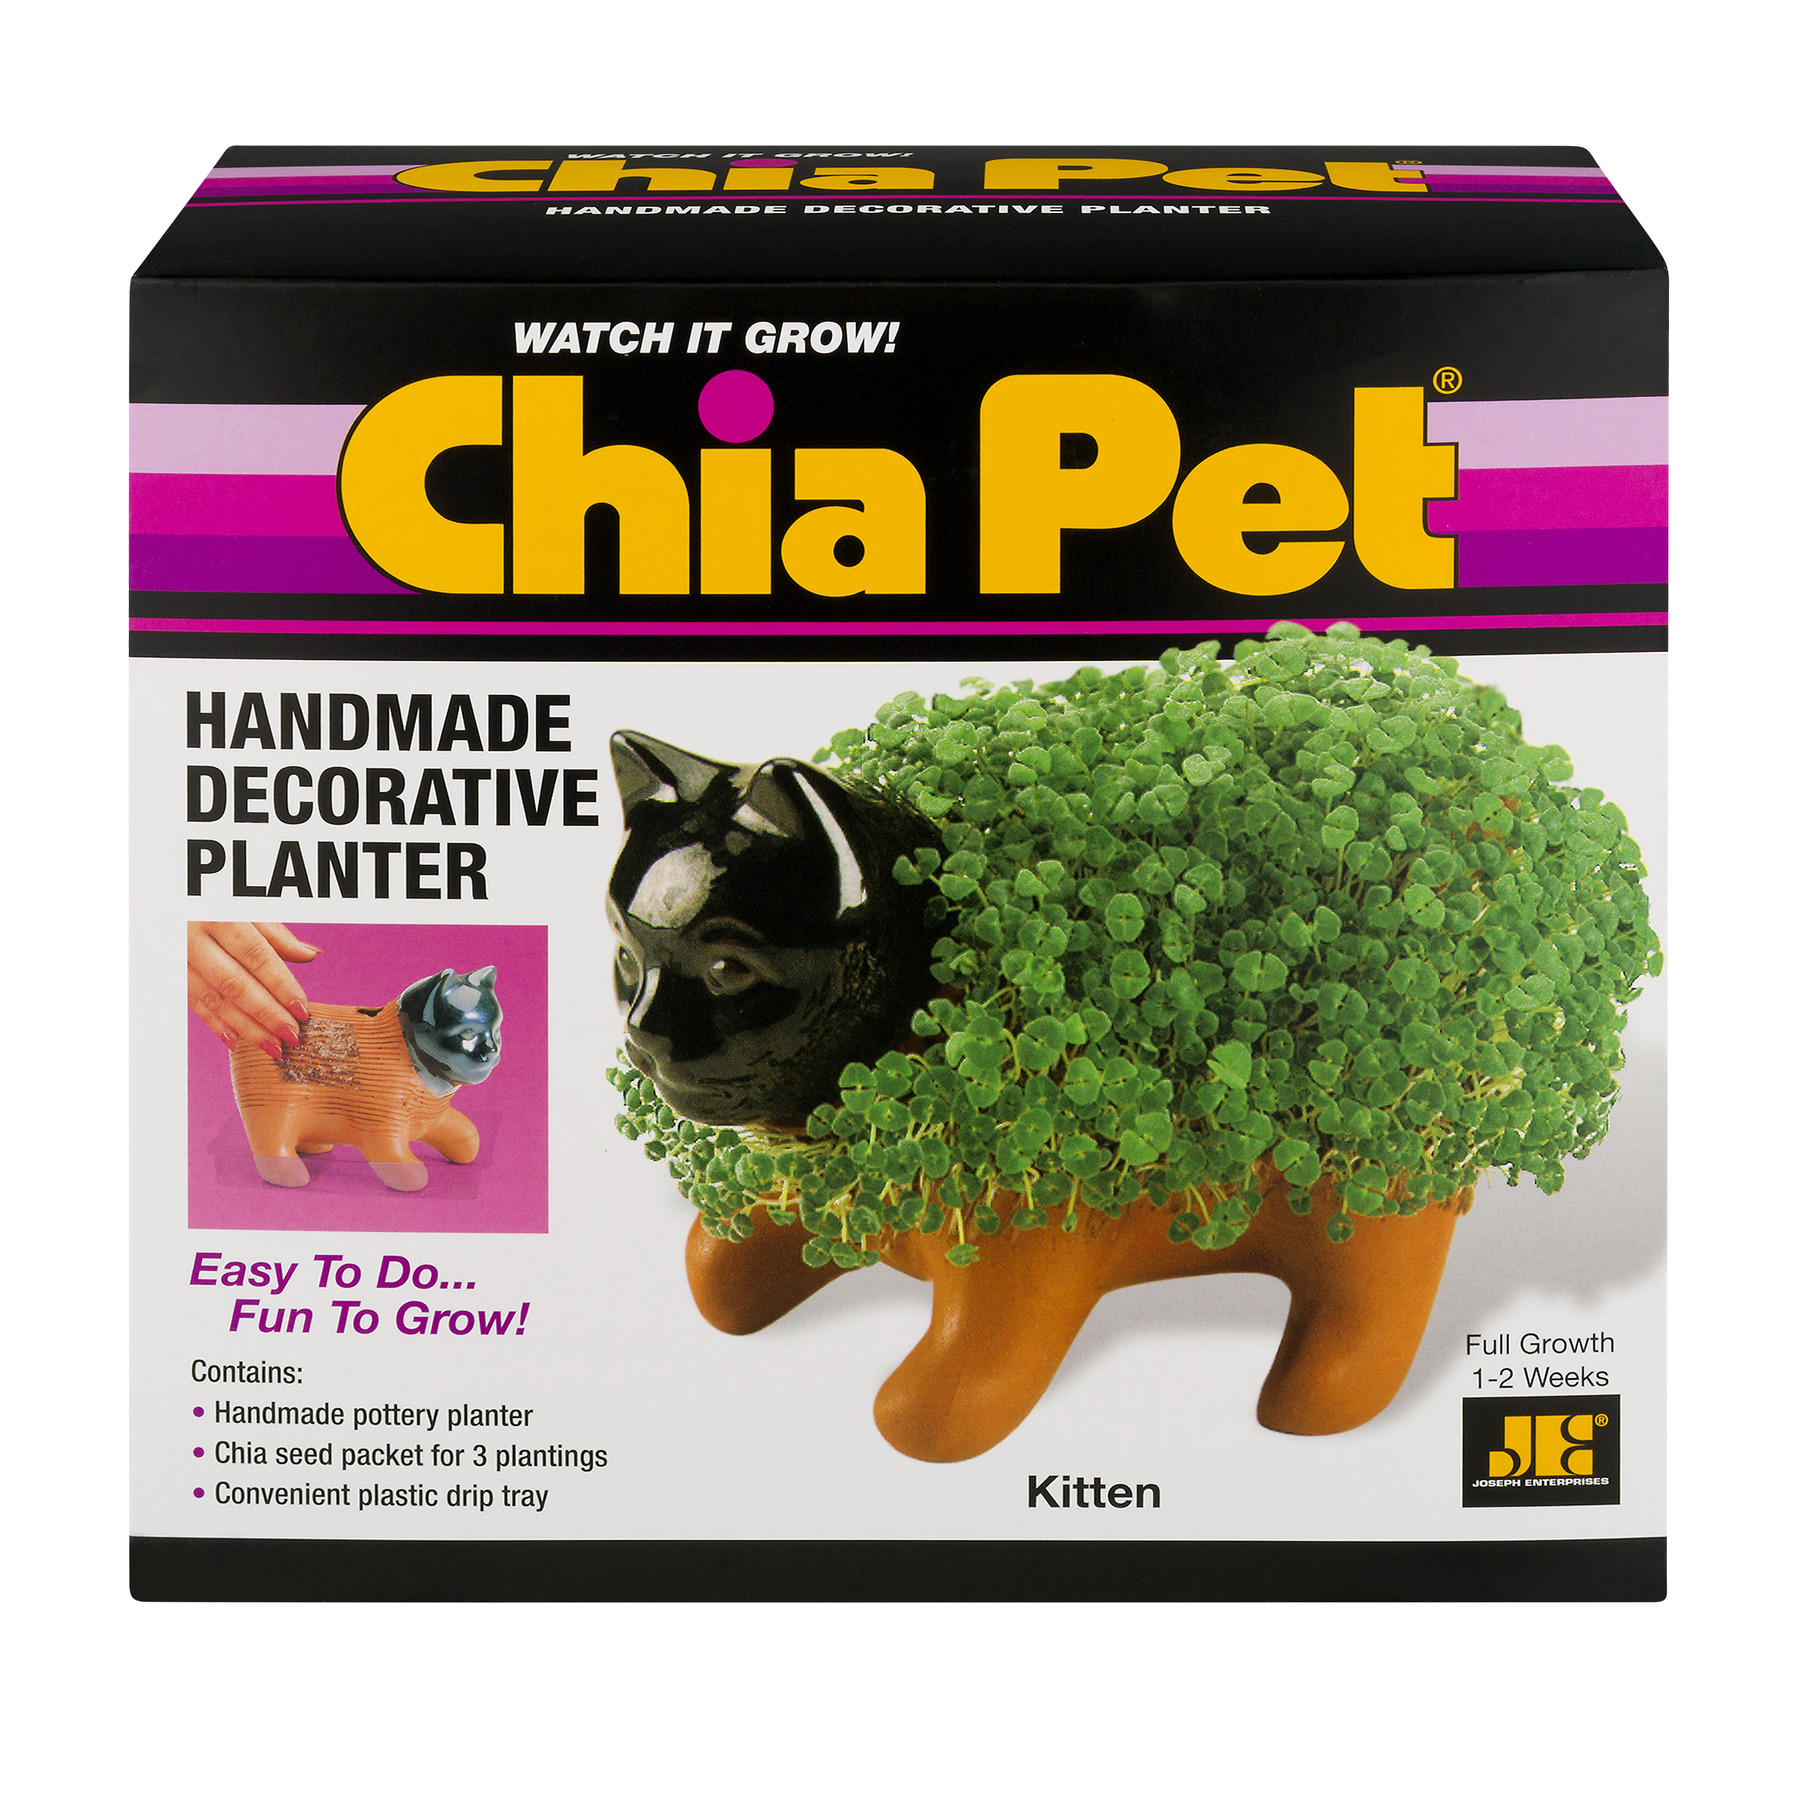 As Seen on TV Chia Pet - Kitten - Handmade Decorative Planter